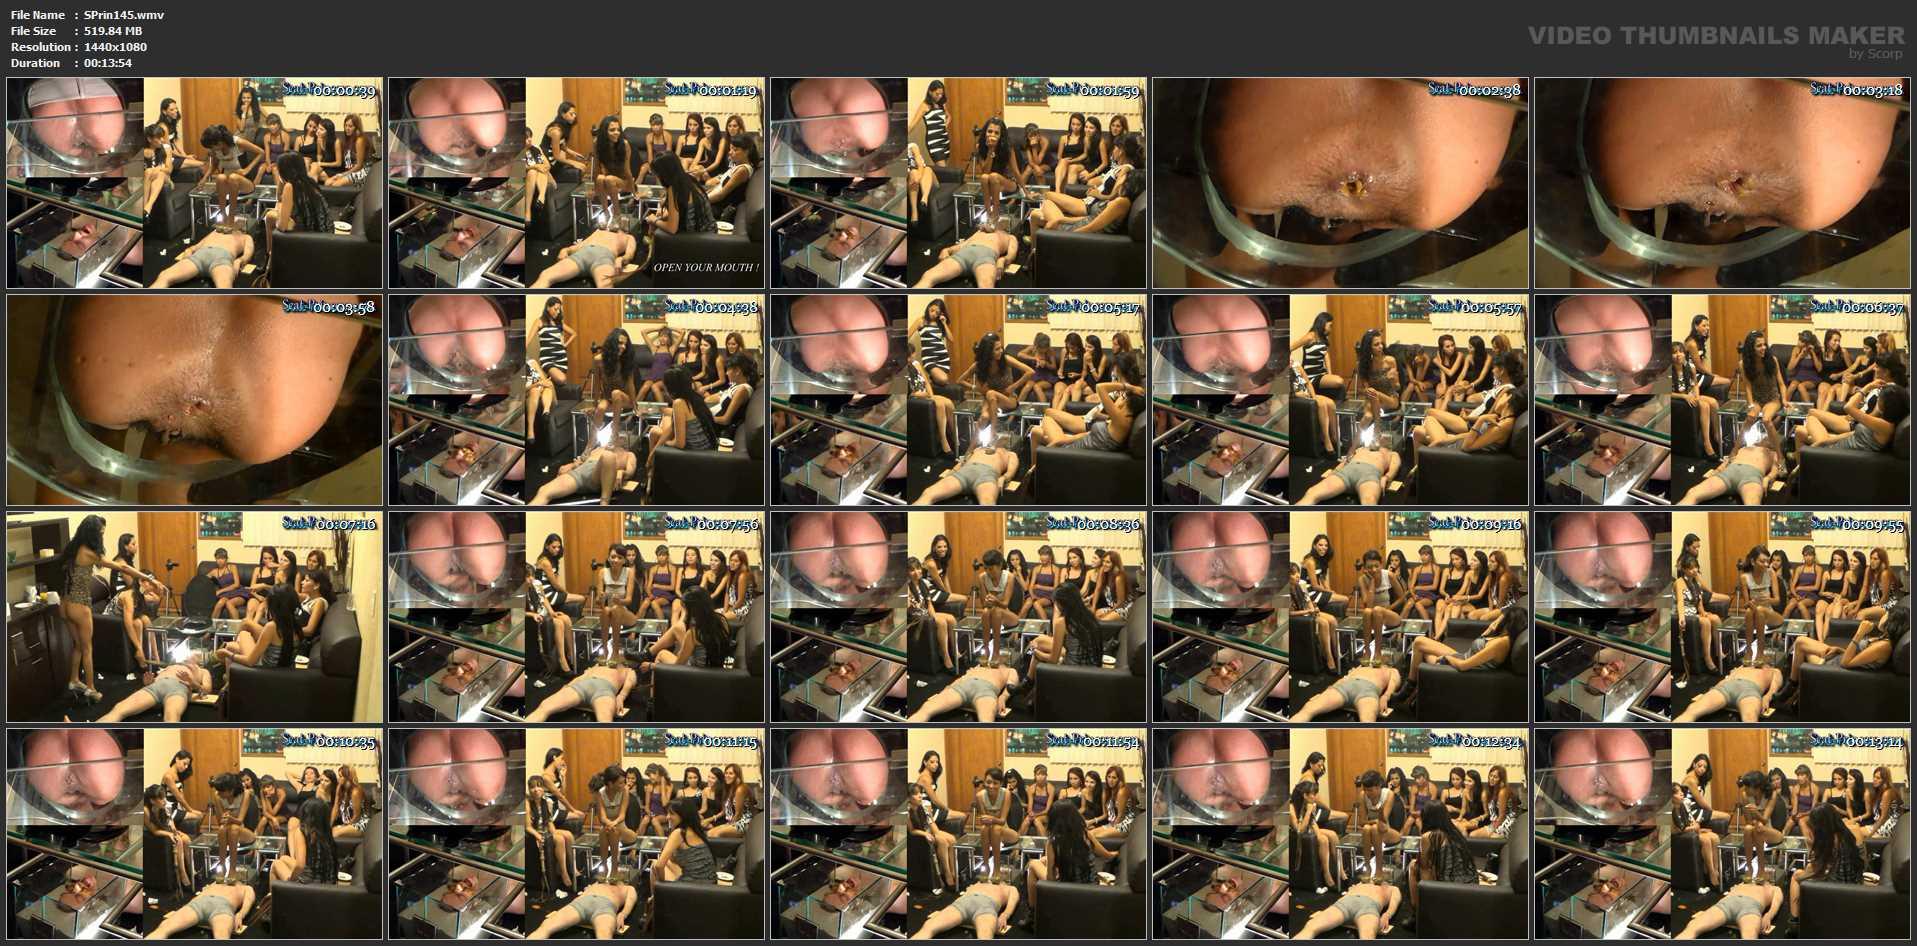 [SCAT-PRINCESS] Solid Rock Combination Please stop Aaah Heeelp Part 03 Britany [FULL HD][1080p][WMV]